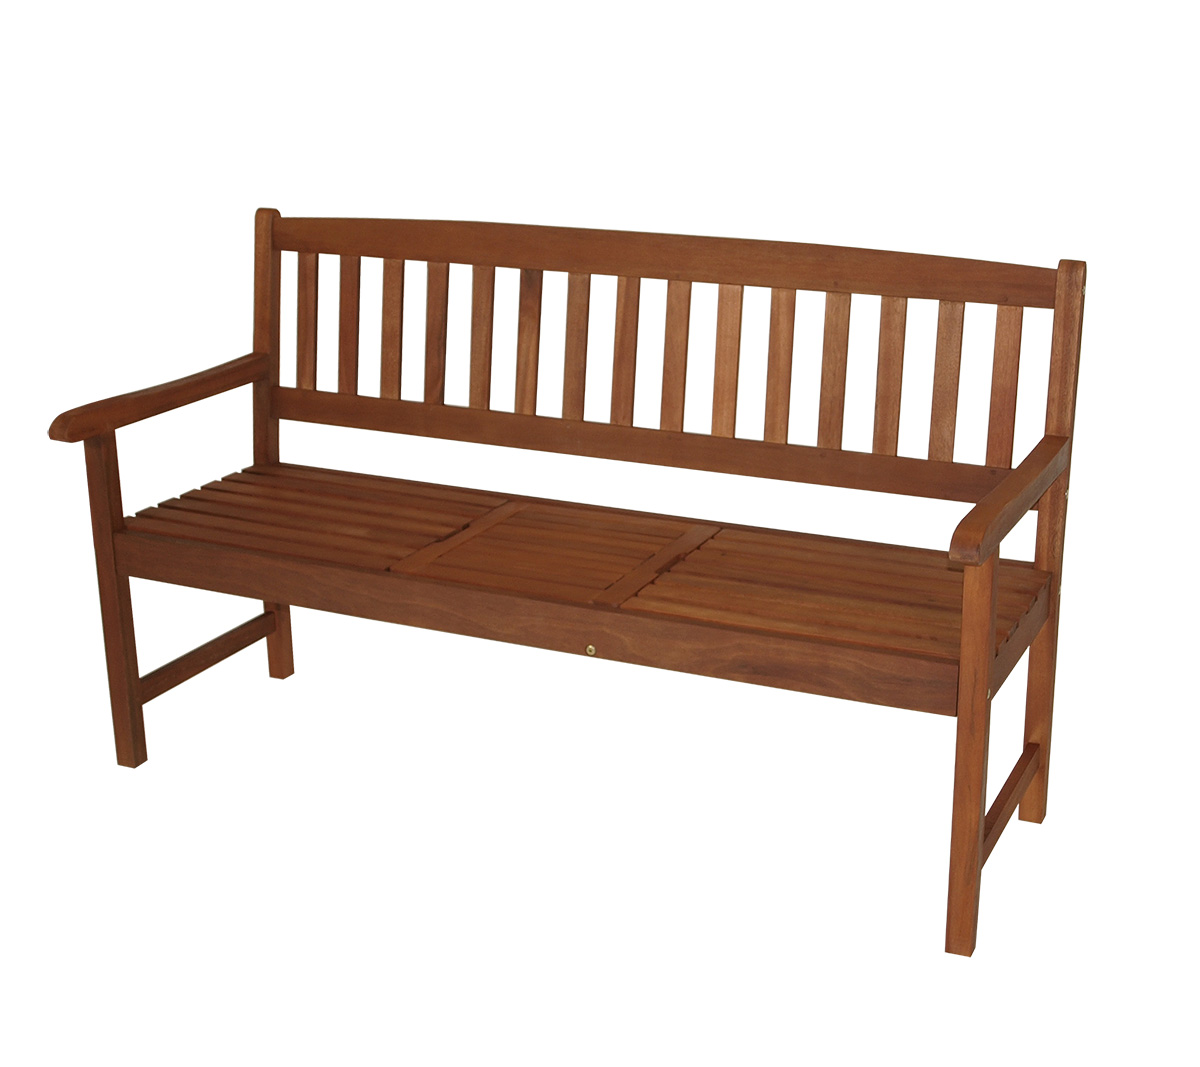 elegante sitzbank saigon mit klapptisch eukalyptusholz fsc zertifiziert ebay. Black Bedroom Furniture Sets. Home Design Ideas